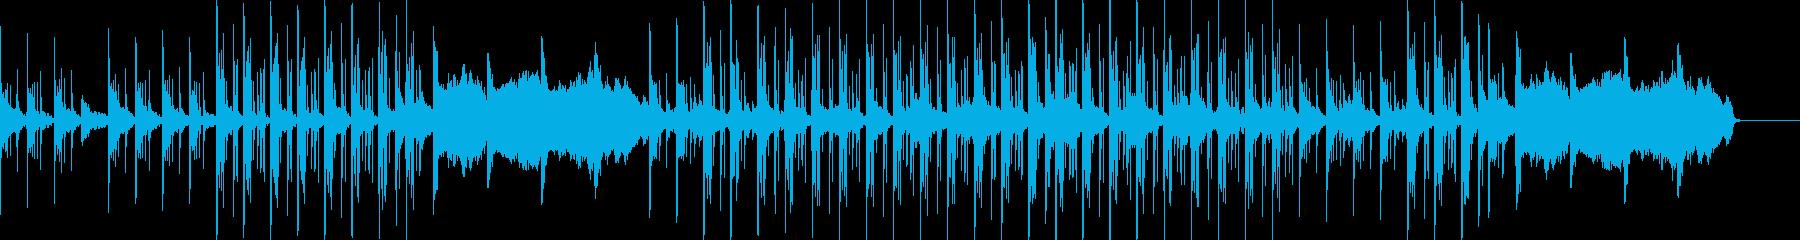 Jazzyなピアノとミニマルなリズムの再生済みの波形